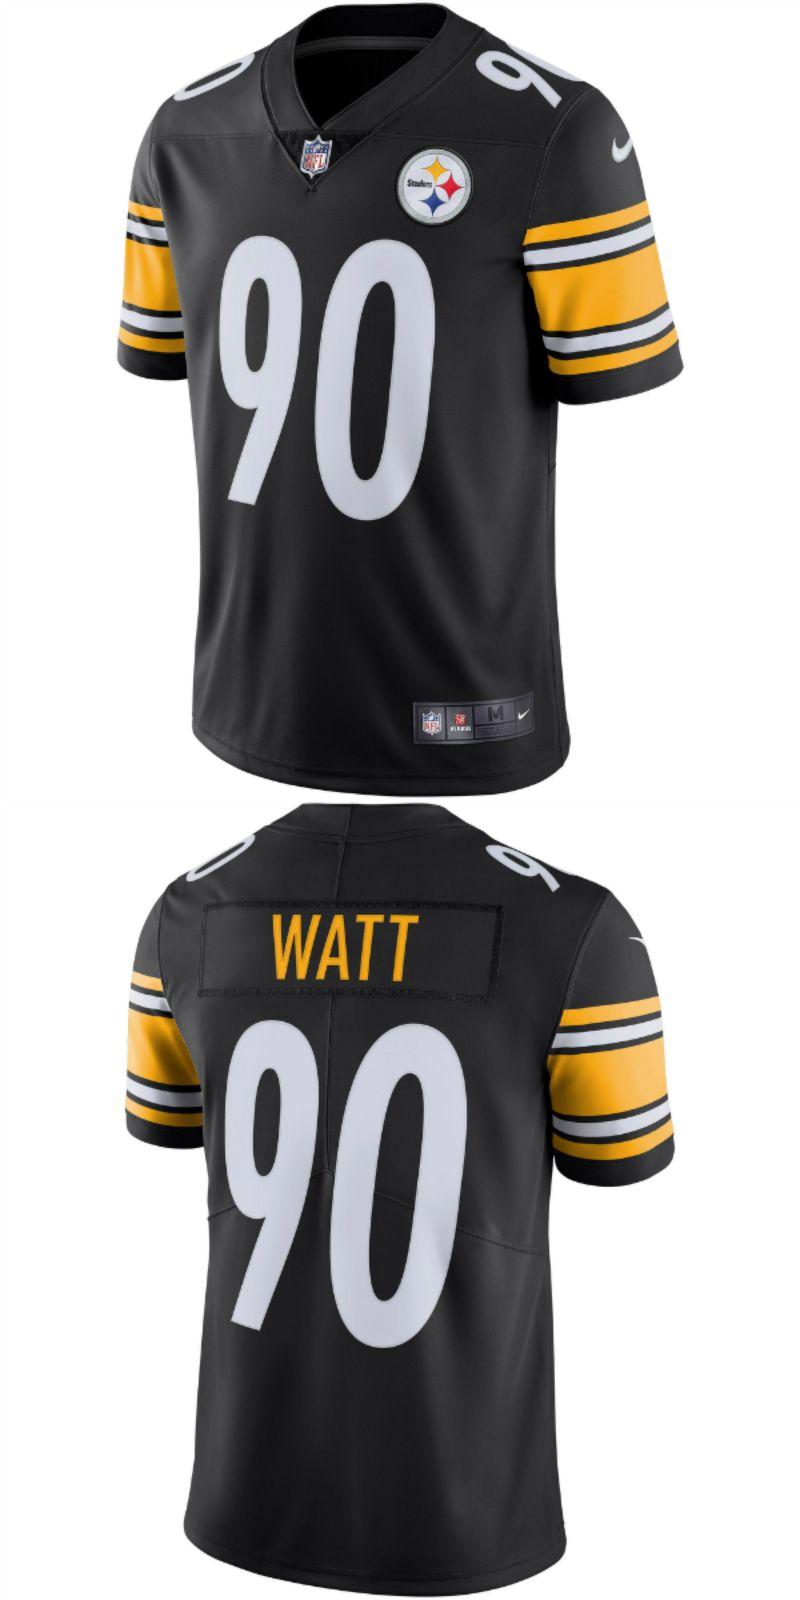 best service 2326d 09e0c UP TO 70% OFF. T.J. Watt Pittsburgh Steelers Nike Vapor ...